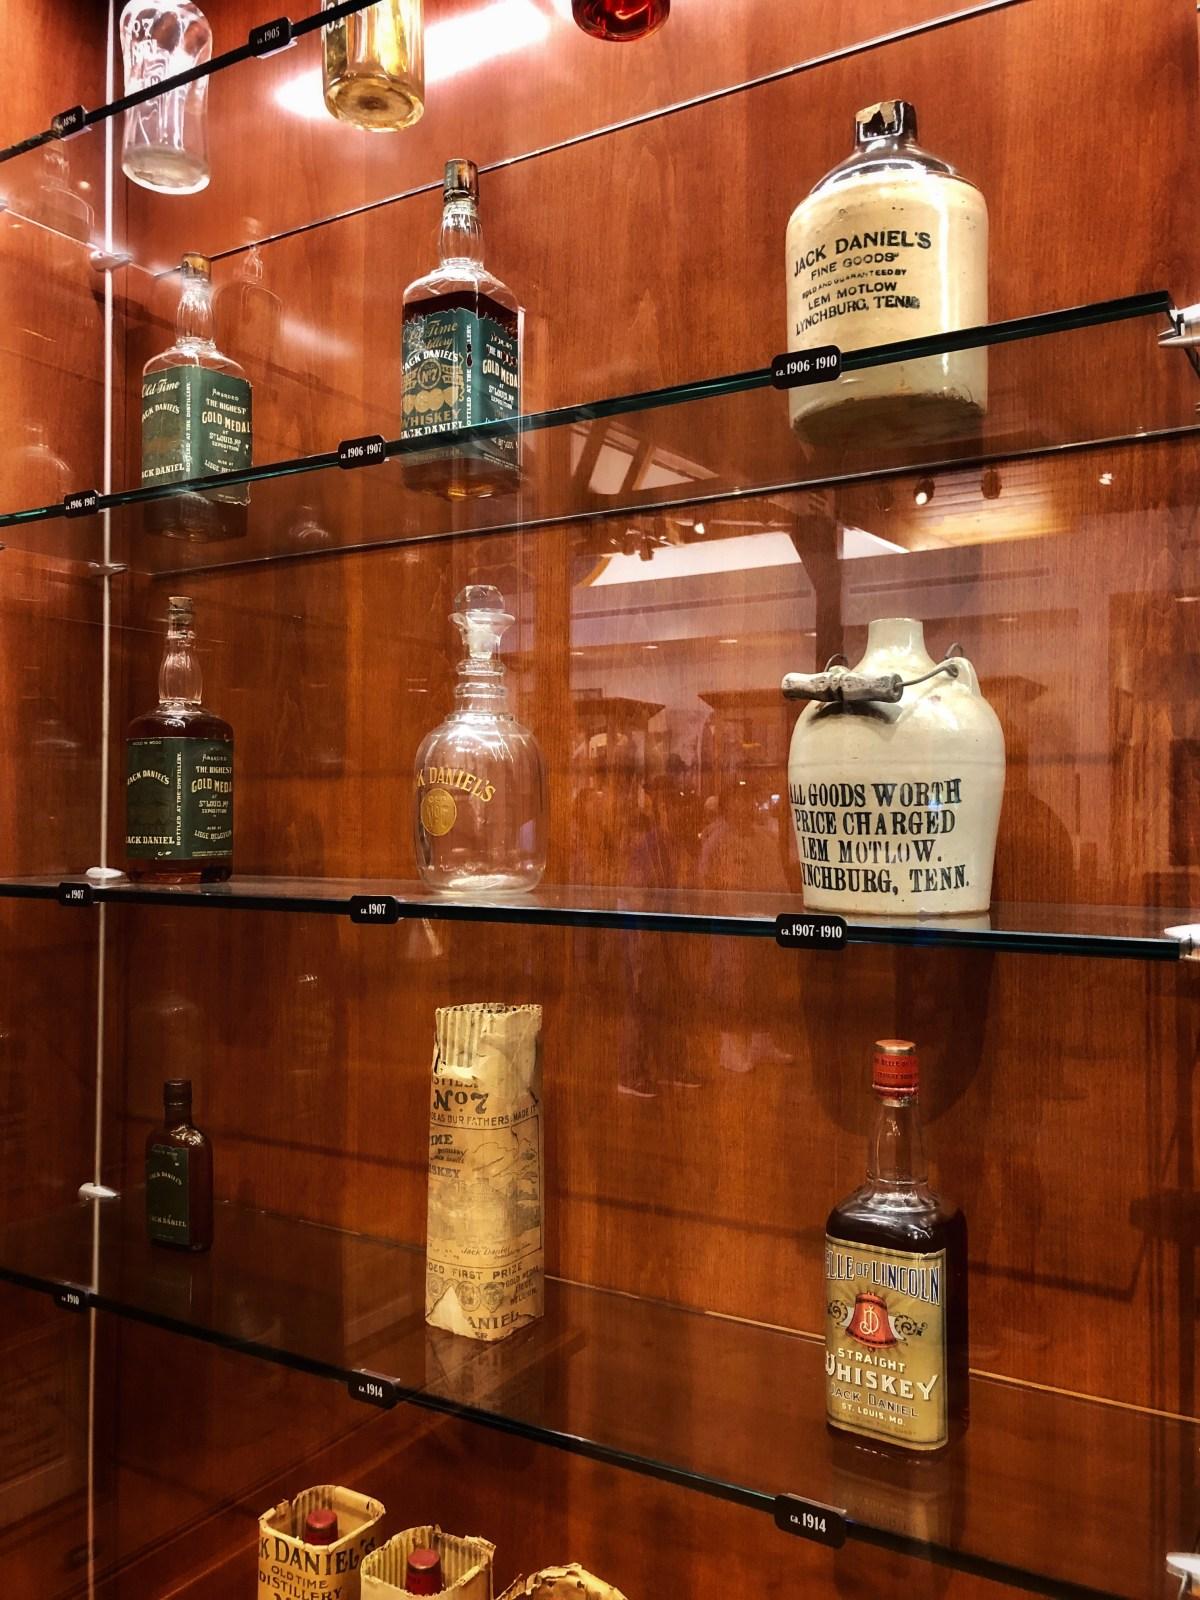 Jack Daniels Distillery #jackdanielsdistillery #jackdanielsdistillerytour #lynchburgtn #lynchburg #jackdaniels #nashville